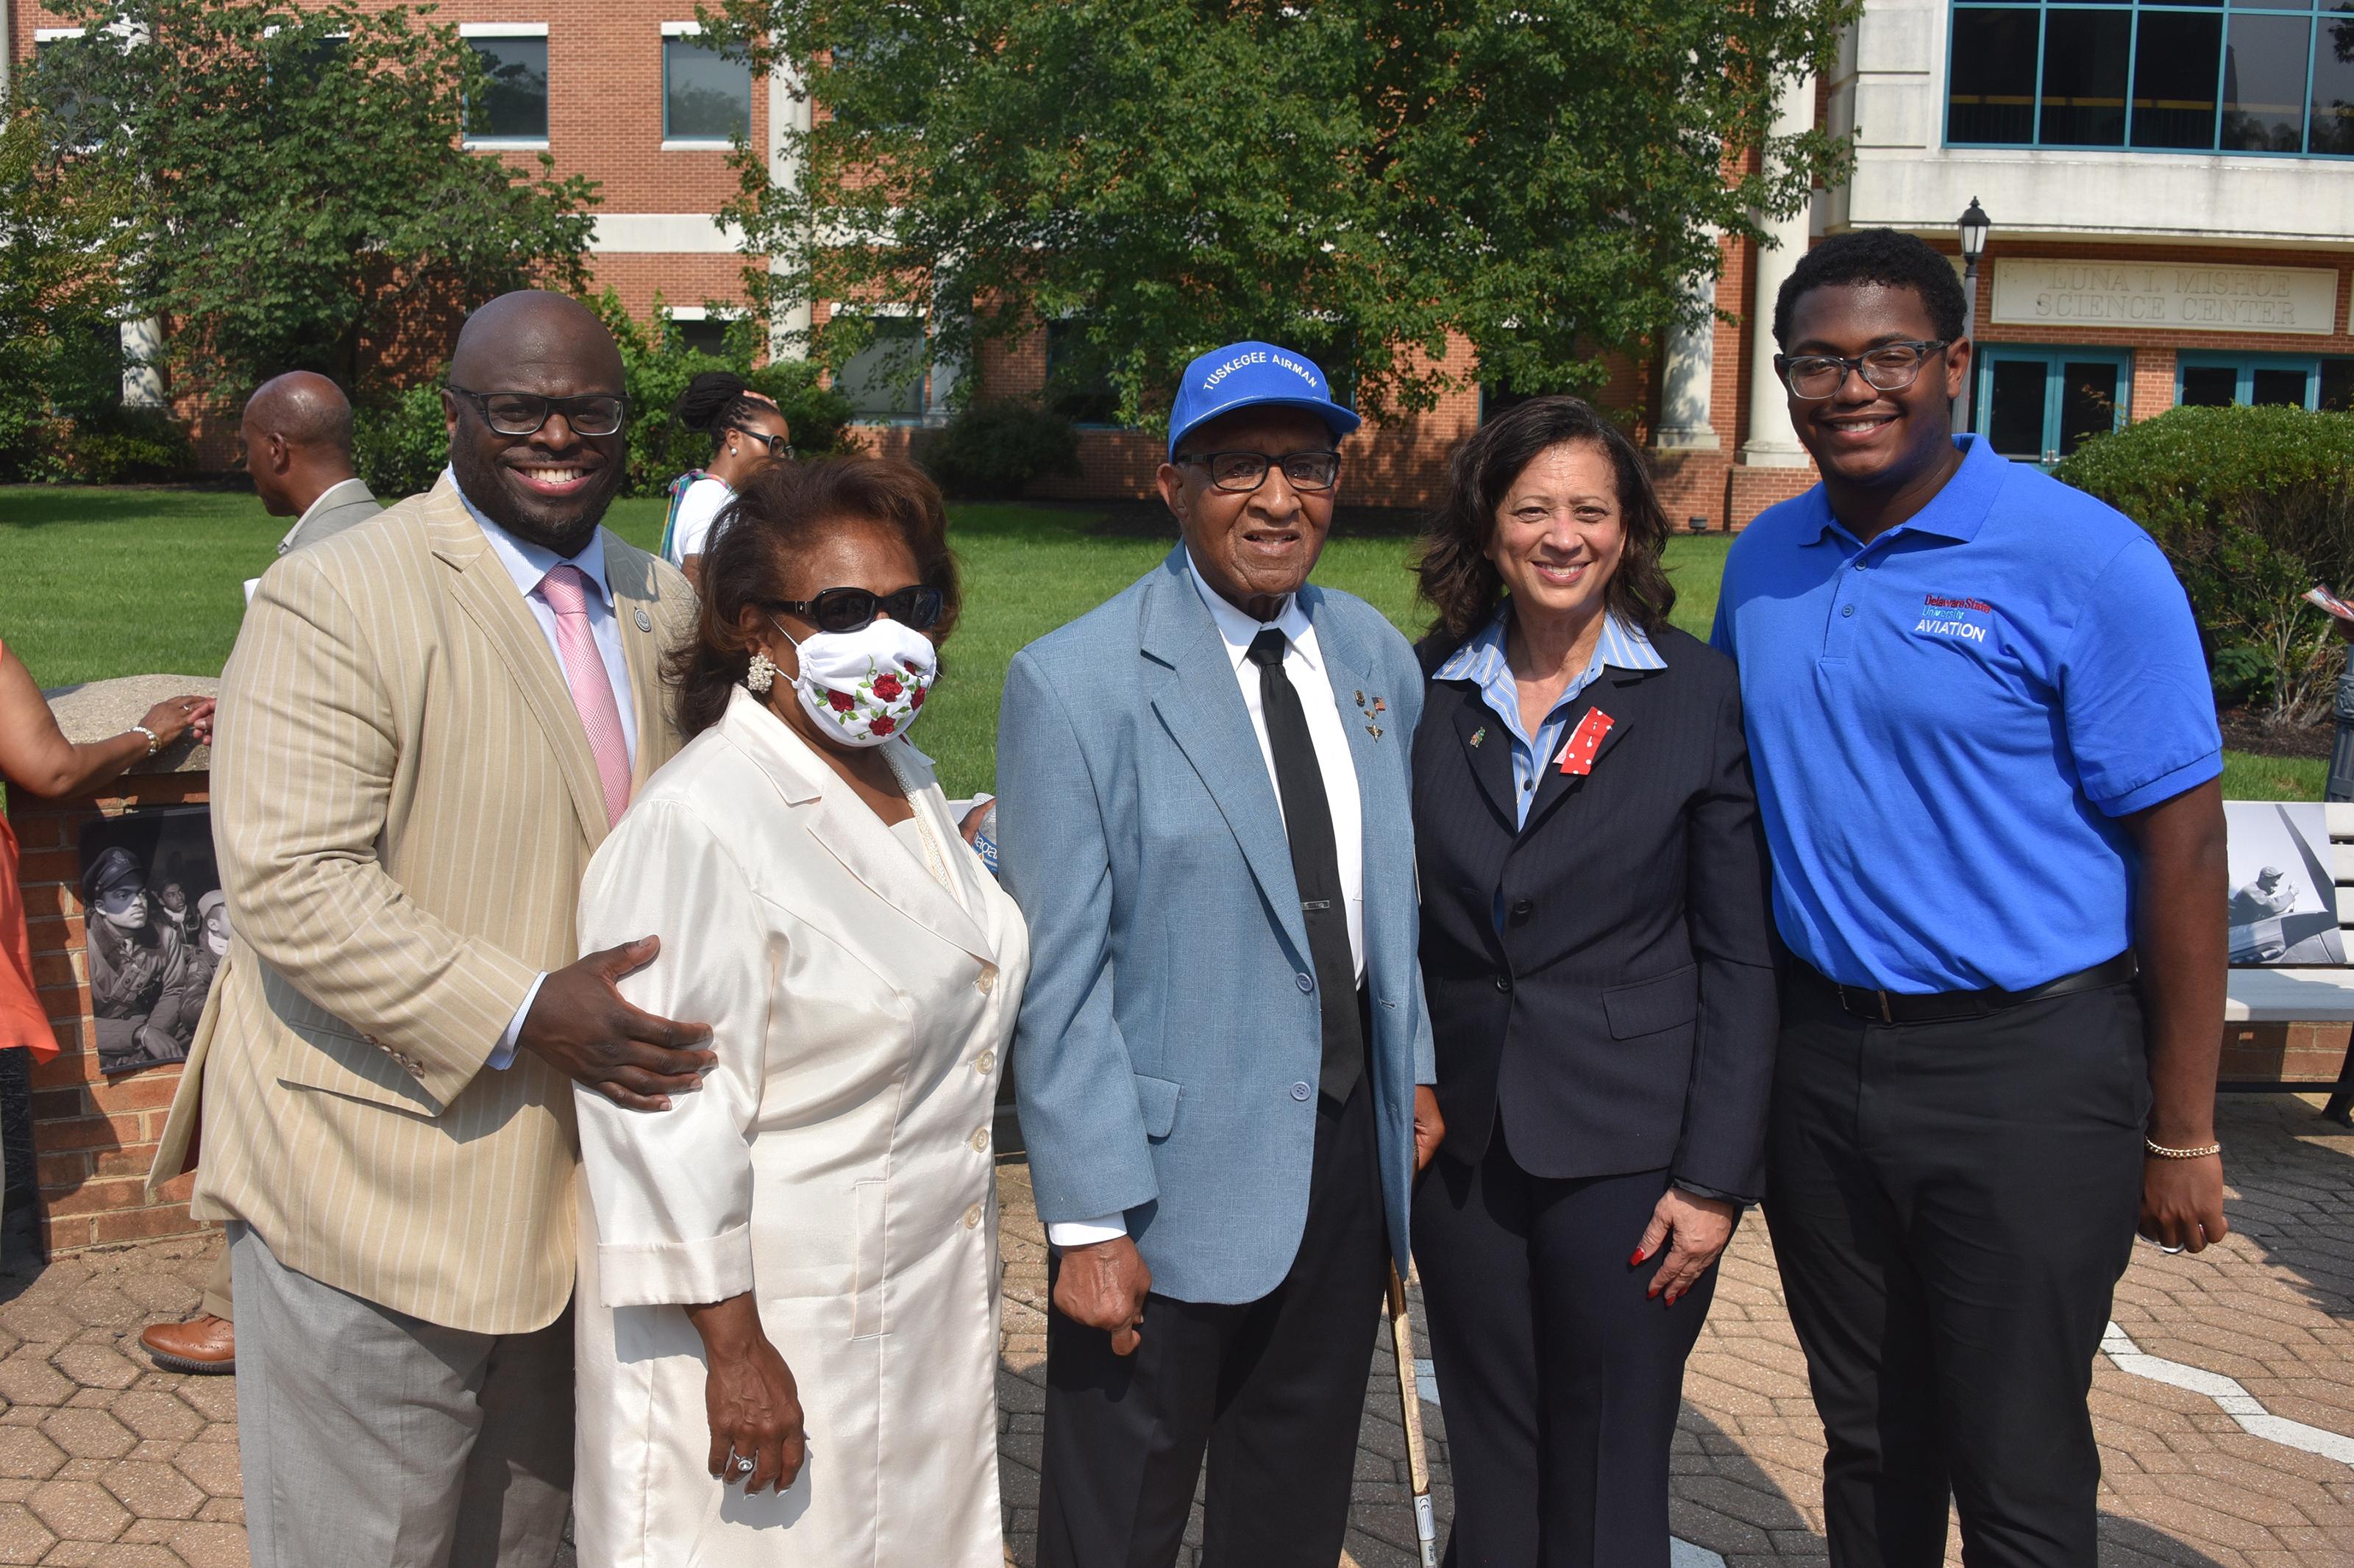 University dedicates a Tuskegee Airmen memorial section on campus